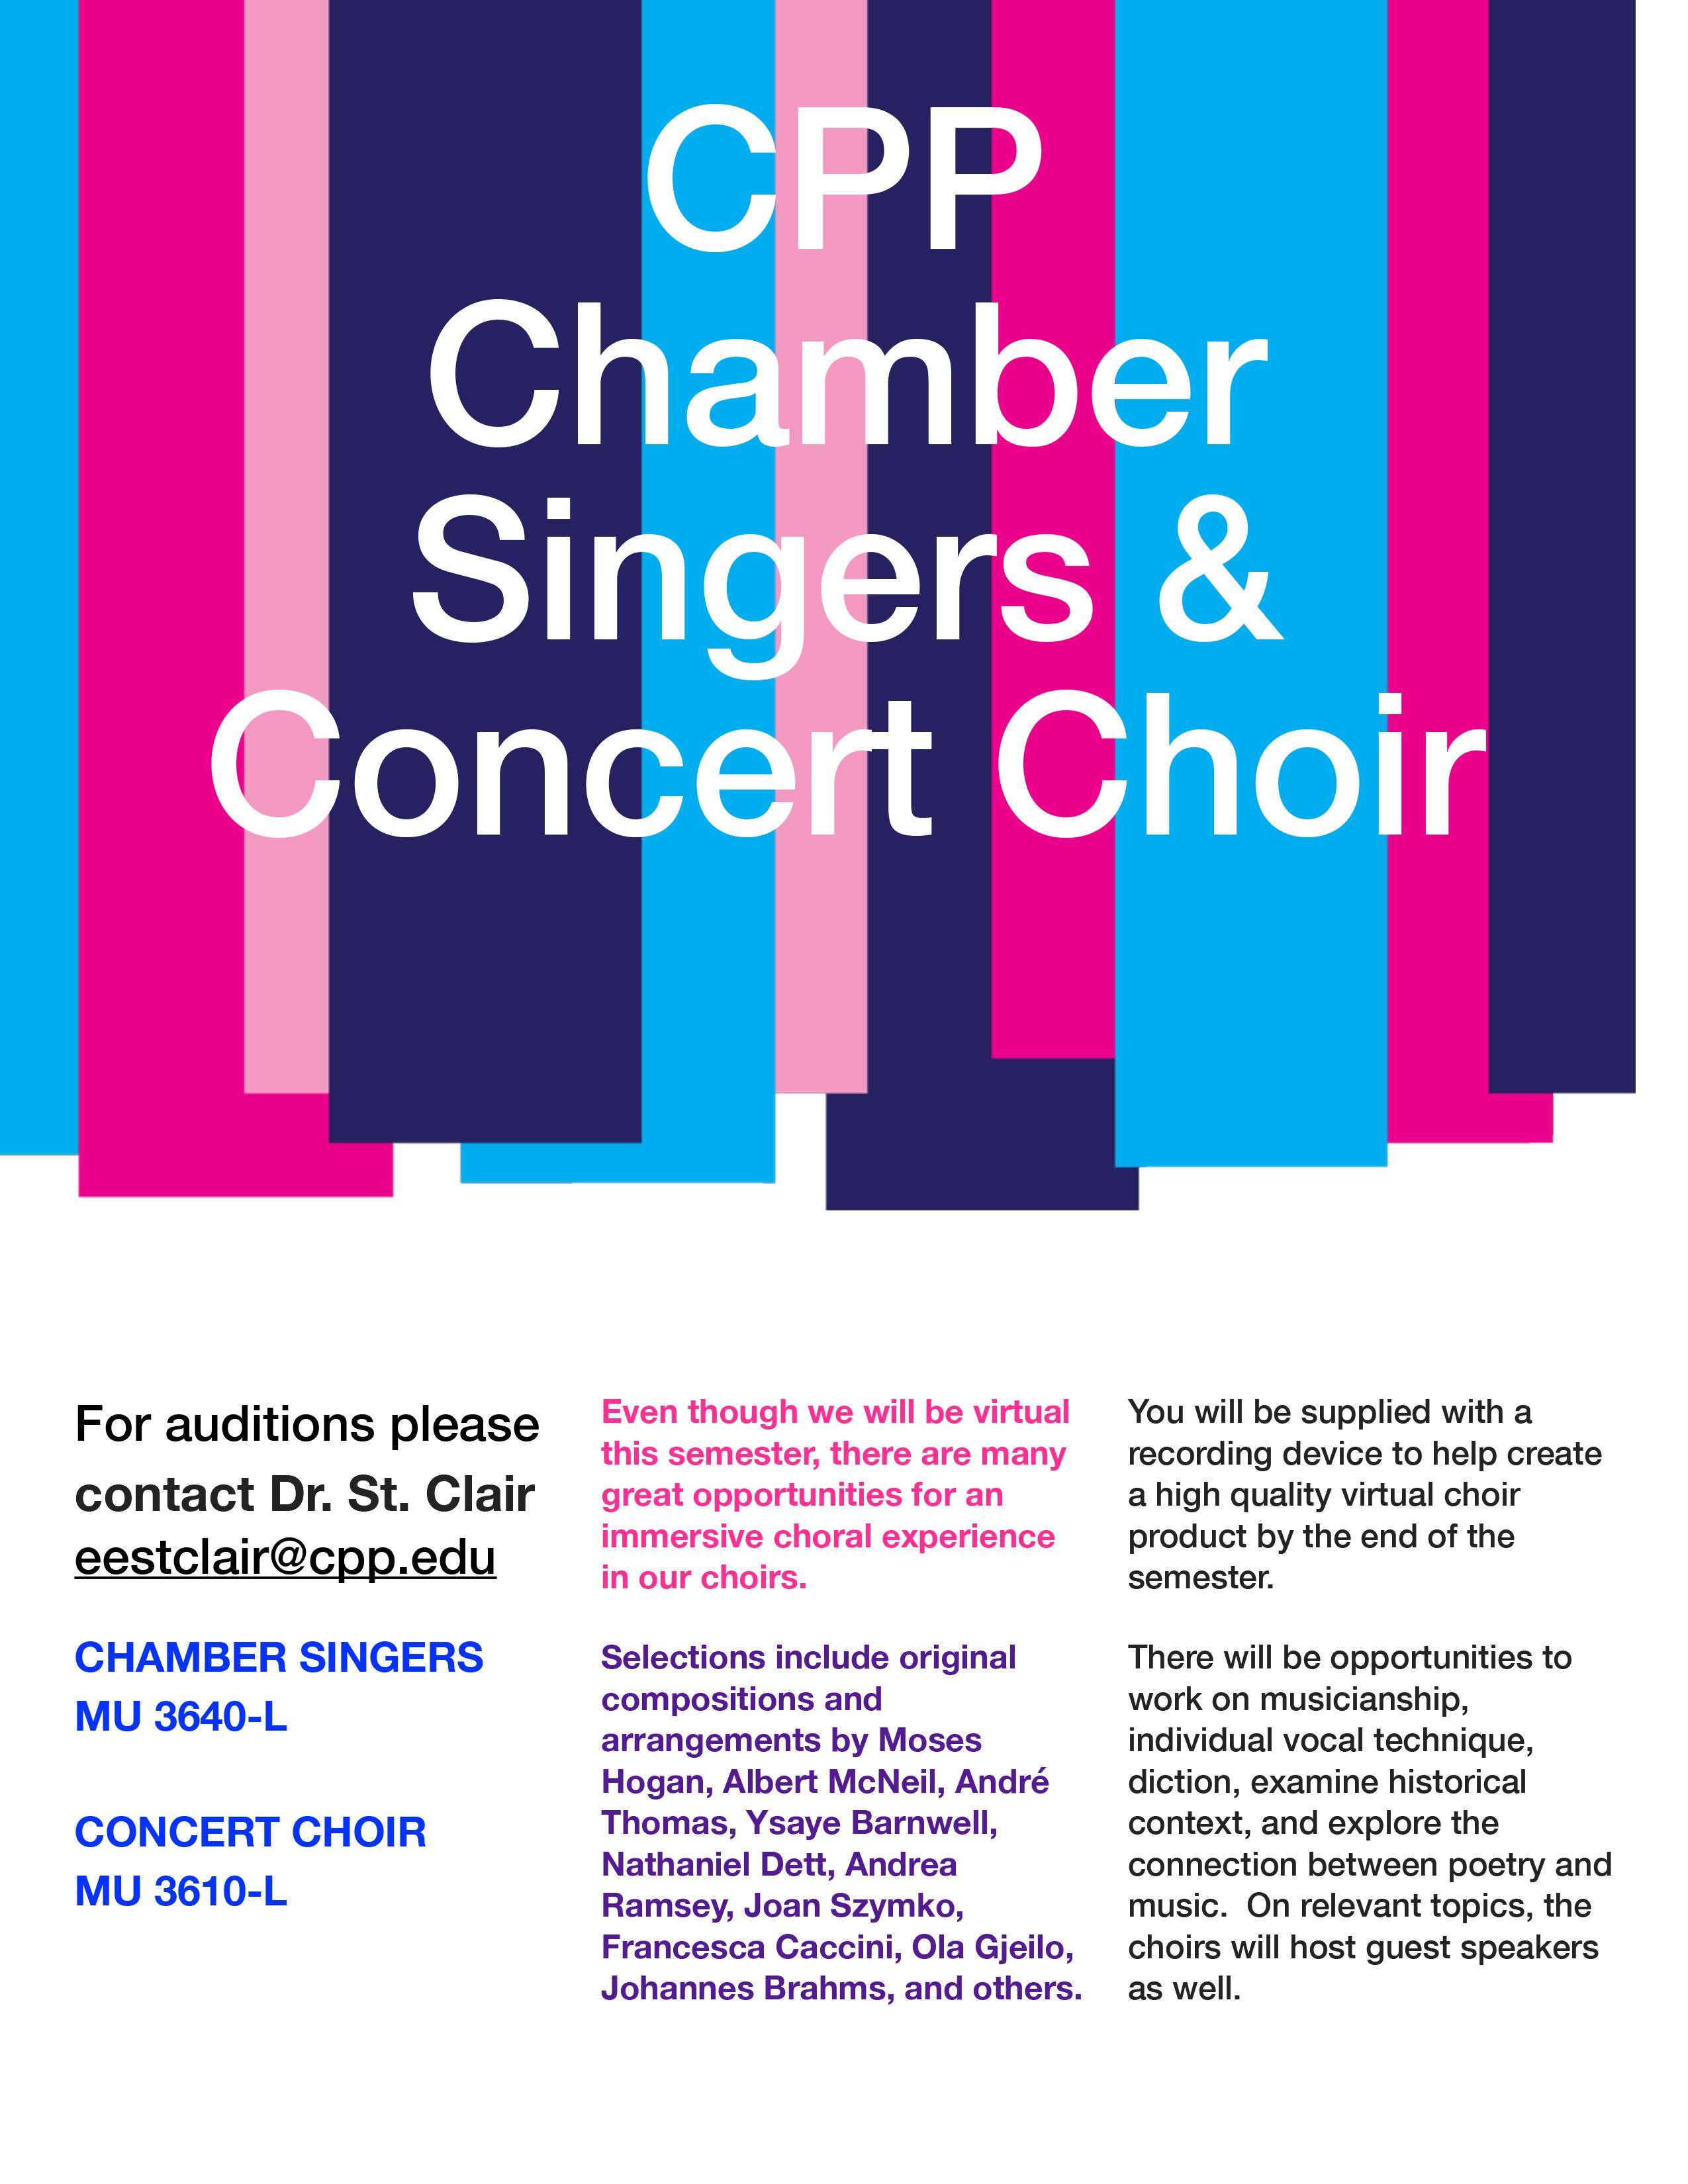 Kellogg Chamber Singers